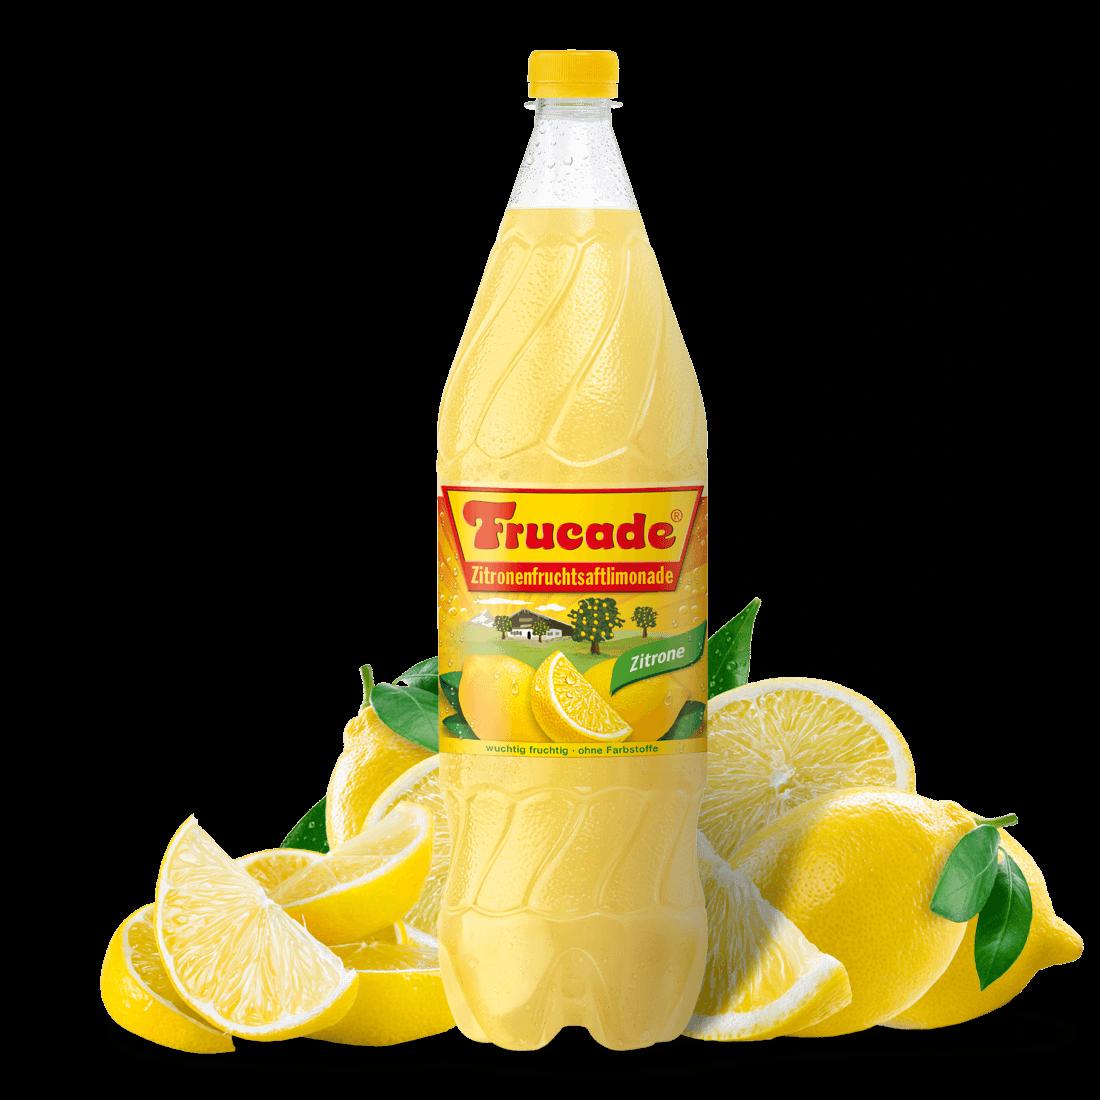 Zitronenfruchtsaftlimonade